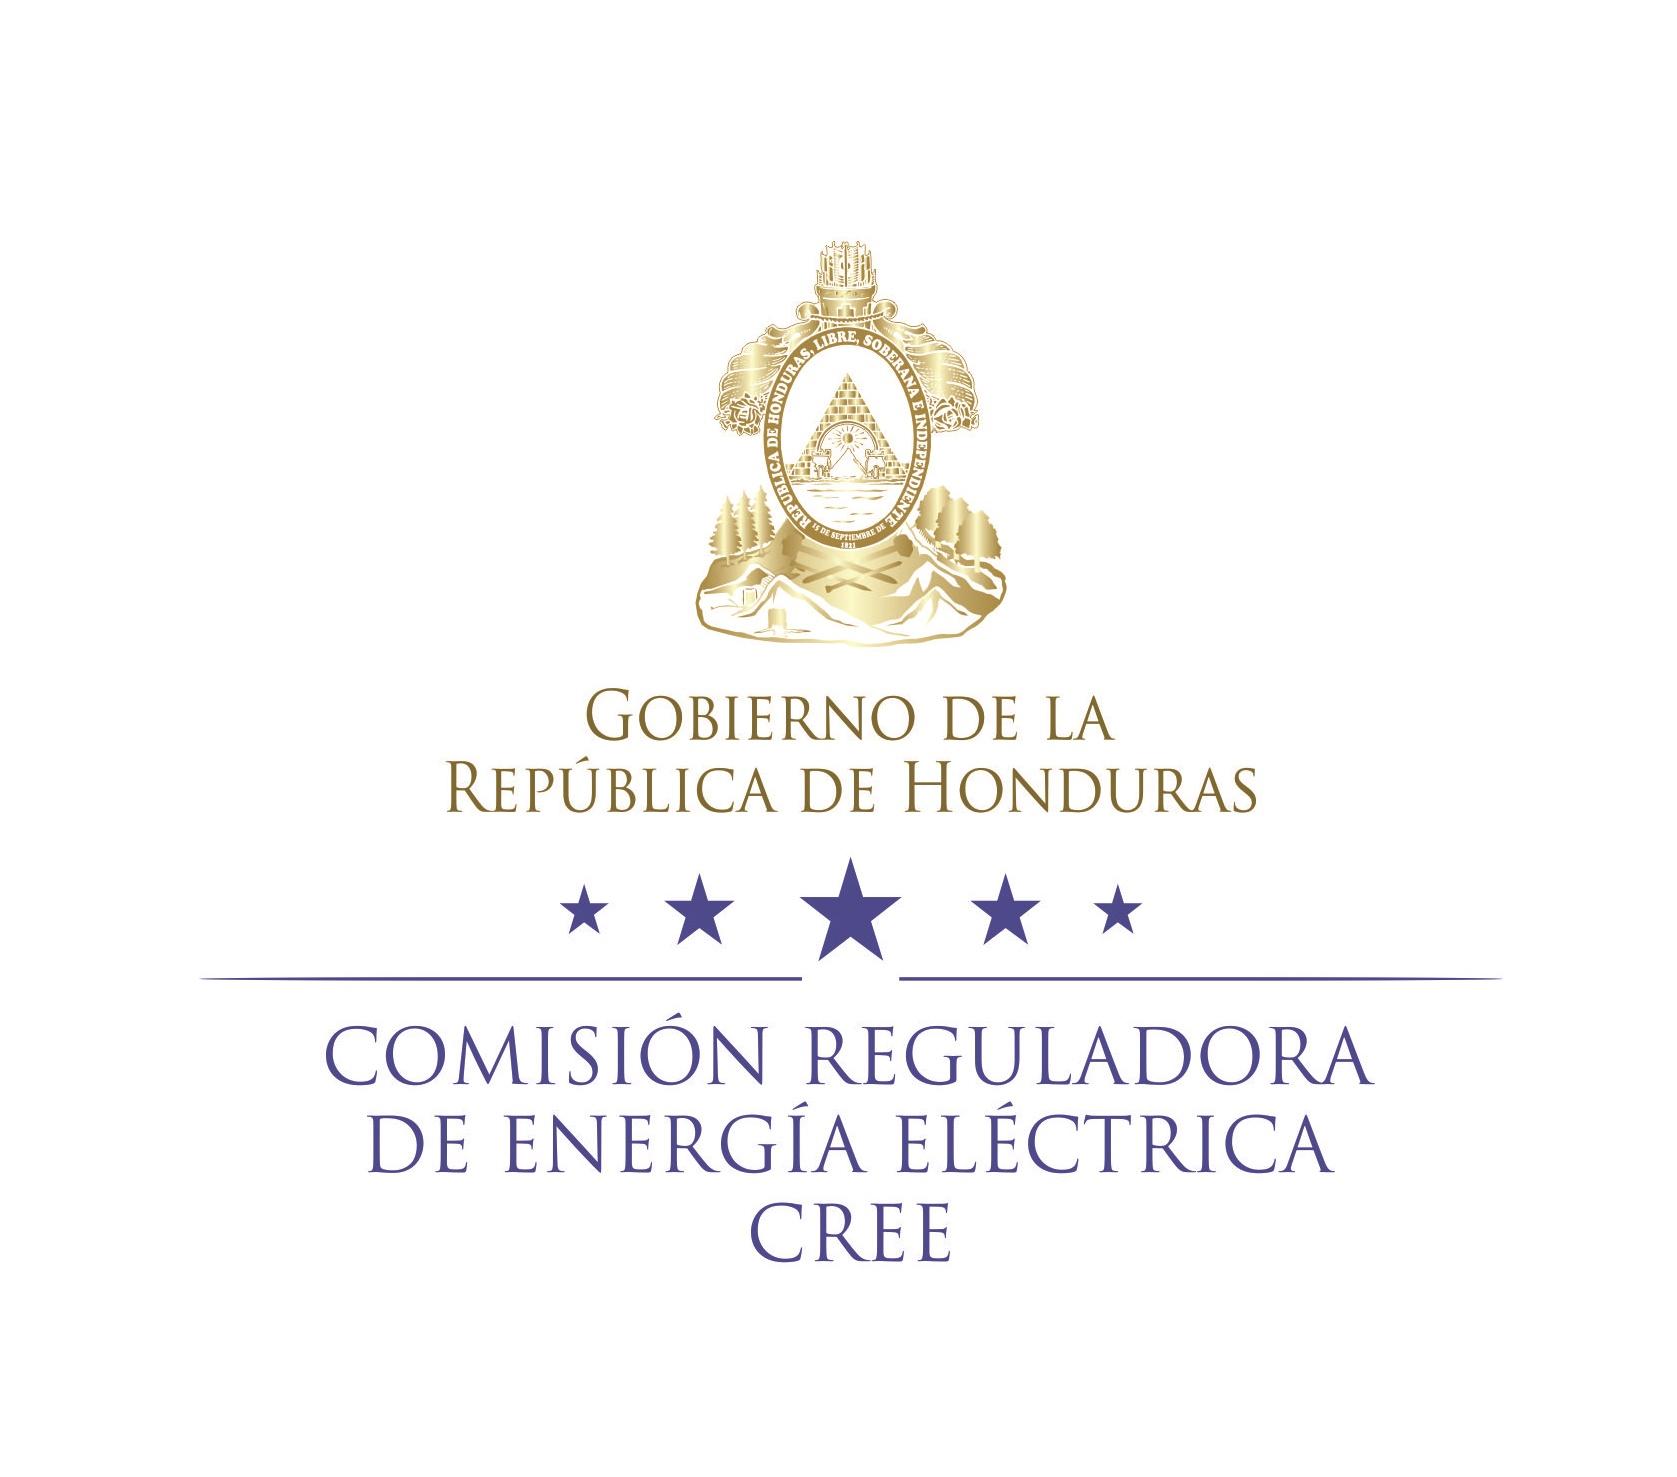 Comisión Reguladora de Eenergía Eléctrica